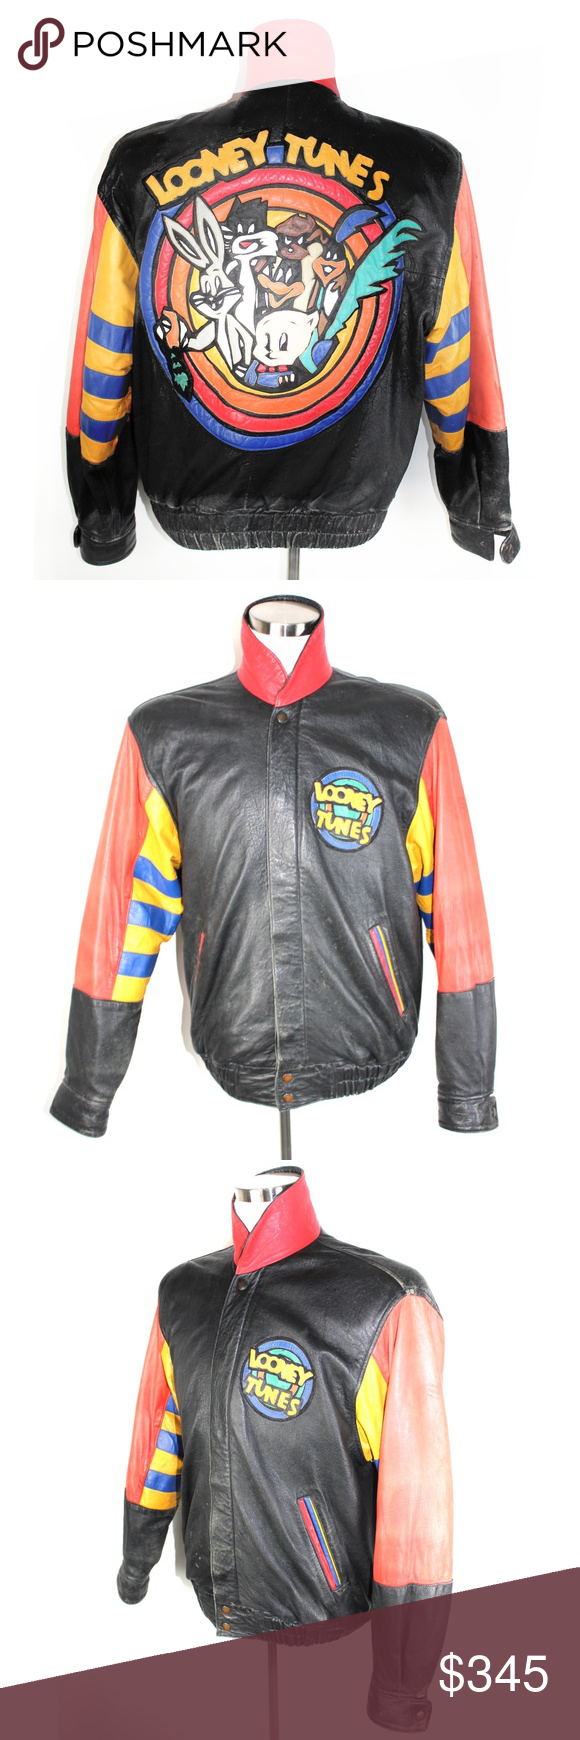 Vintage Jeff Hamilton Looney Tunes Leather Jacket Vintage Leather Jacket Jackets Leather